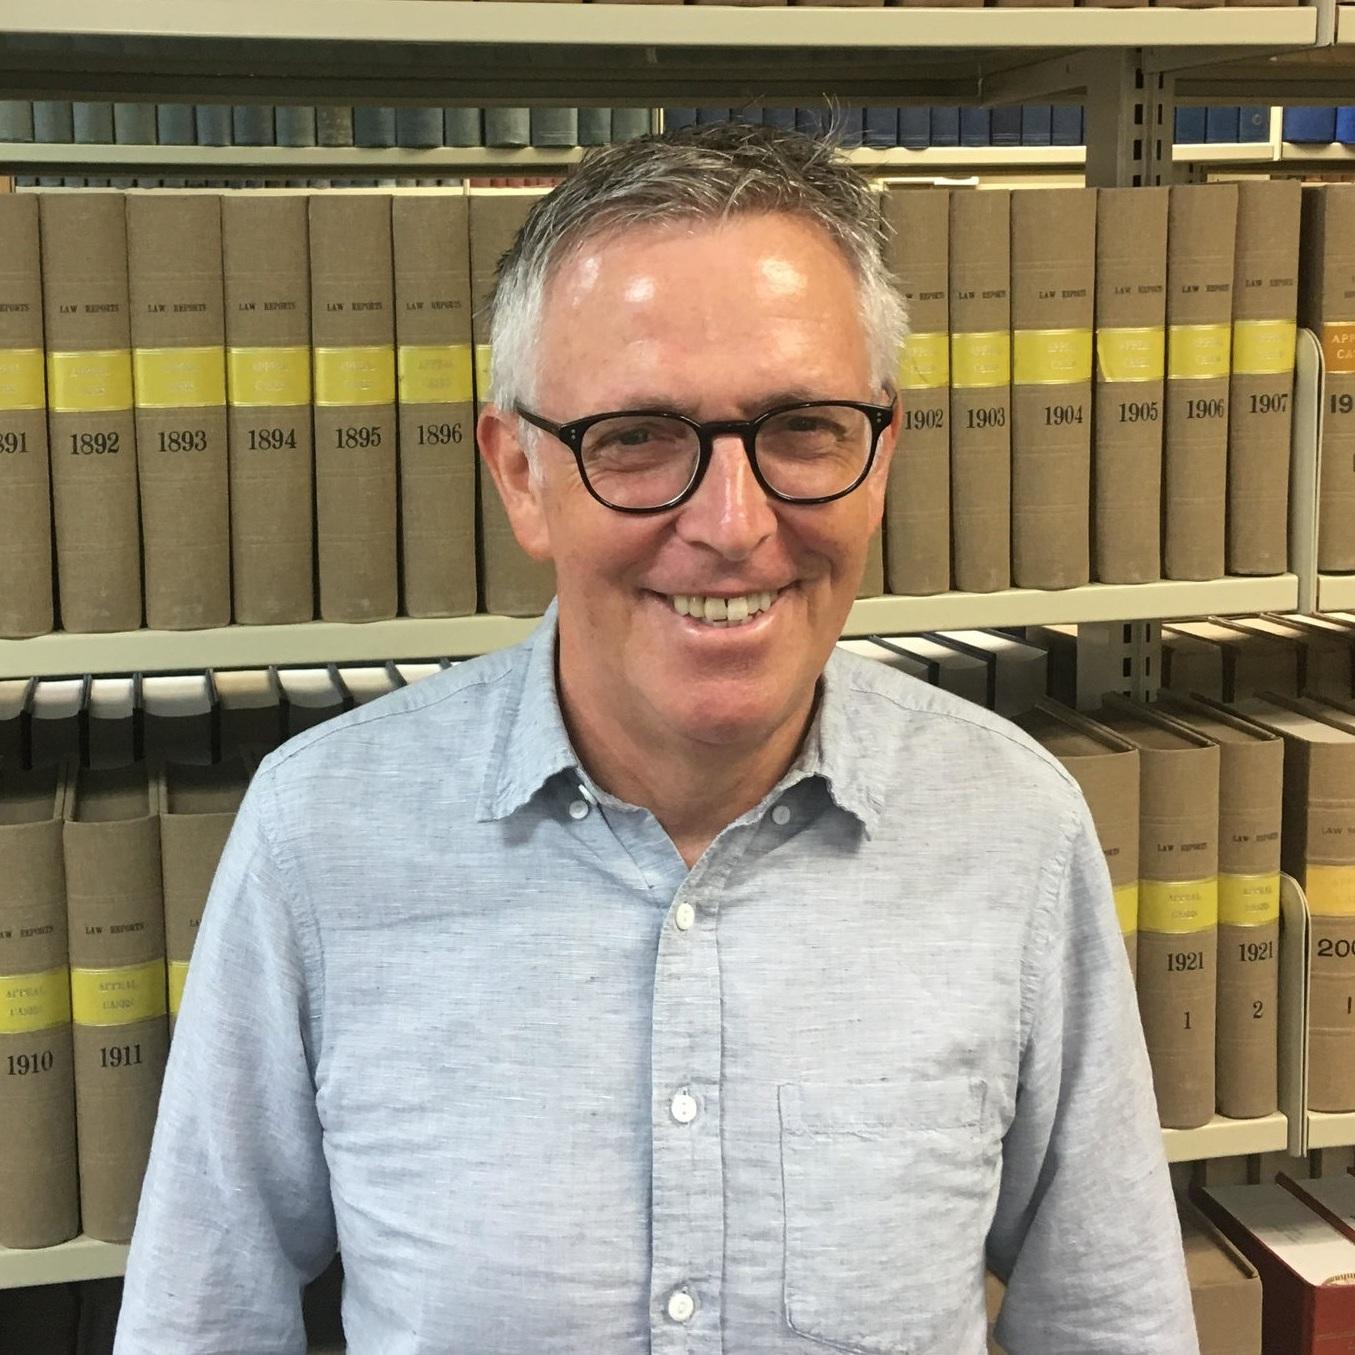 Derek O'Brien - Truman Bodden Law School, Cayman Islands